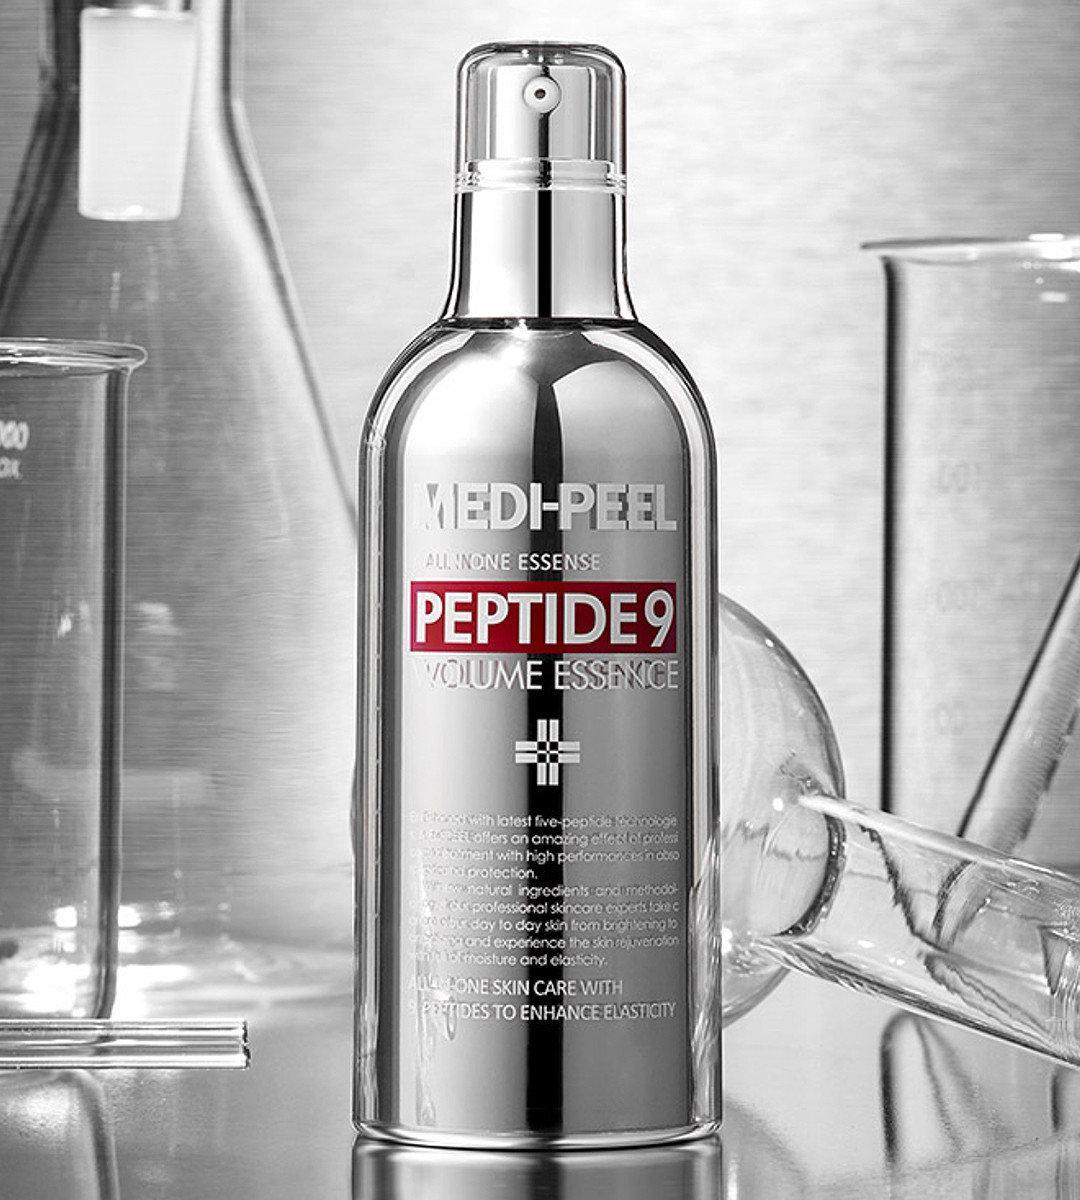 Эссенция с пептидами для эластичности кожи MEDI-PEEL – Peptide 9 Volume Essence 100ml